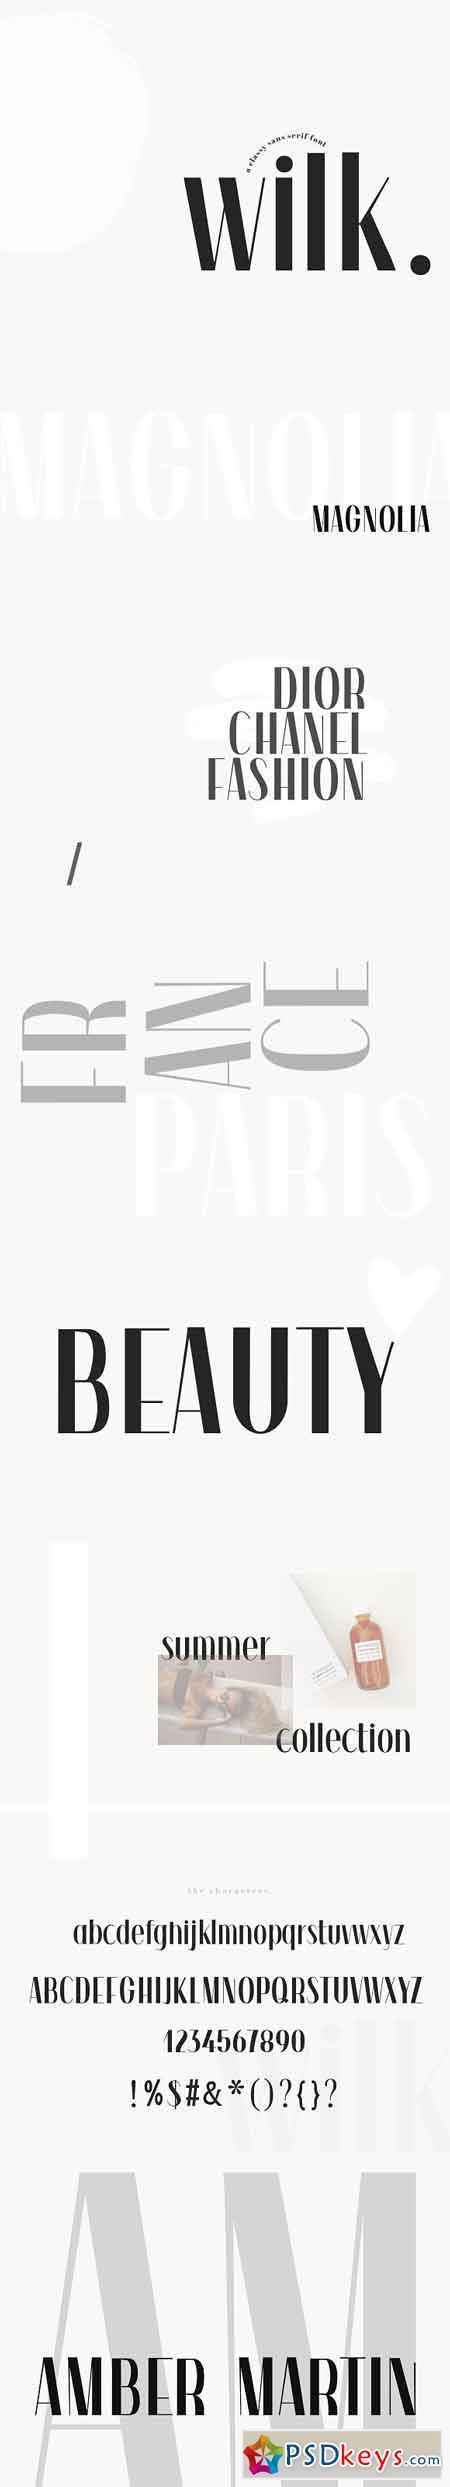 Wilk - A Classy Sans Serif Font 3098023